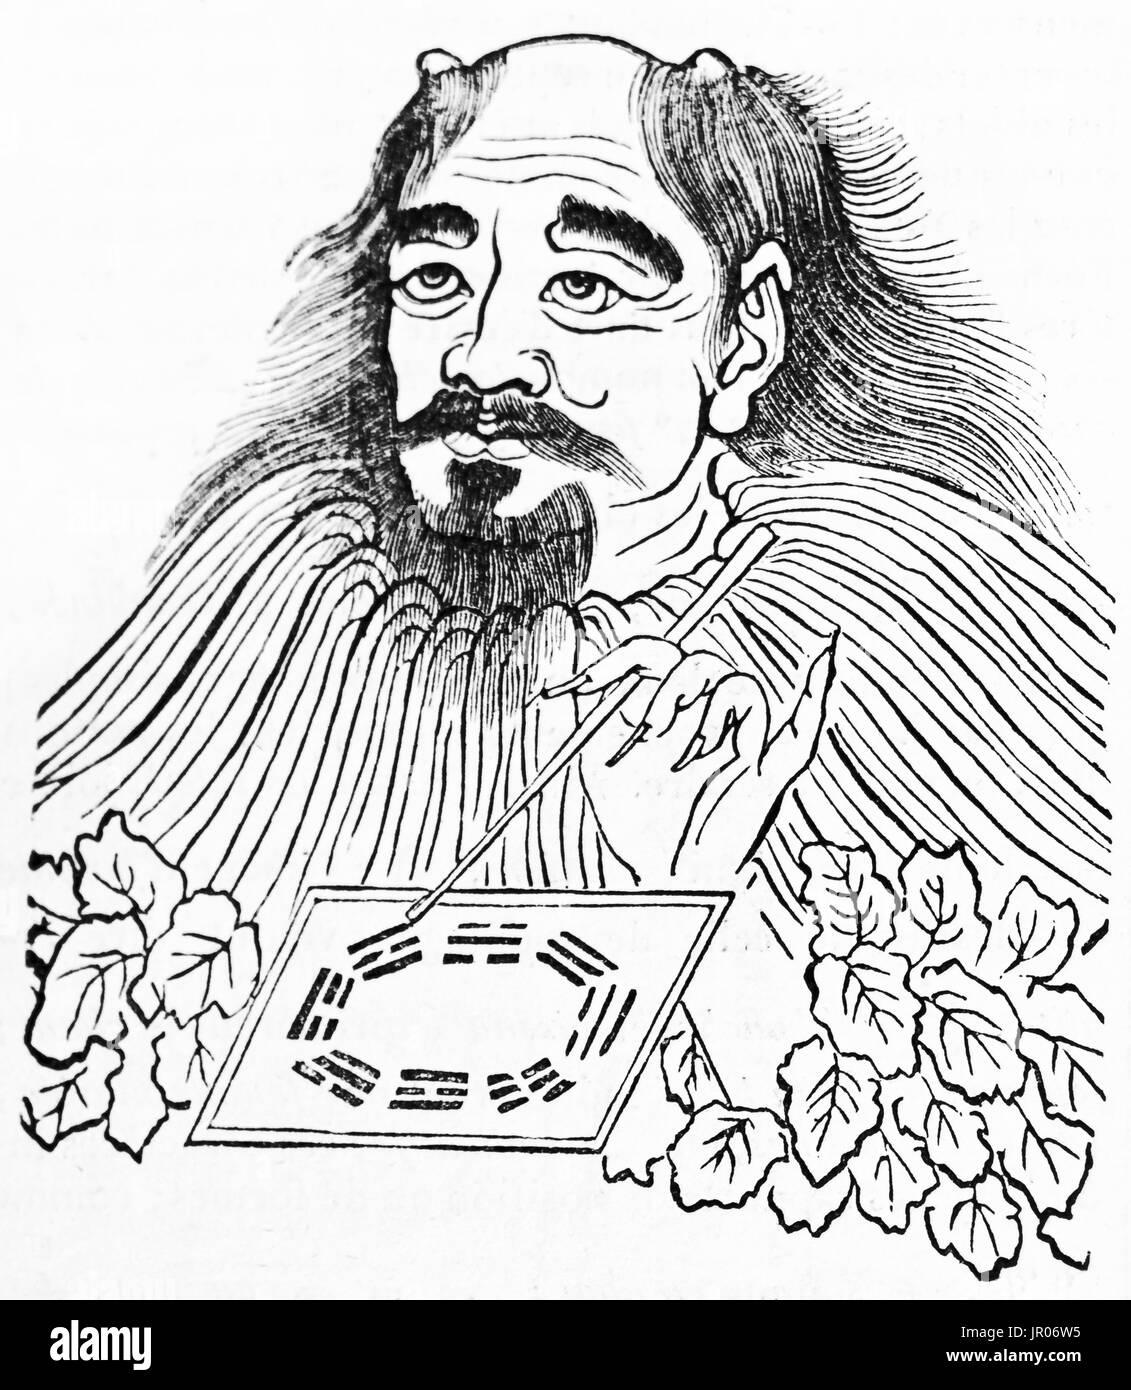 Old engraved rapresentation of Fuxi, Chinese mythological hero. By unidentified author, published on Magasin Pittoresque, Paris, 1833. - Stock Image